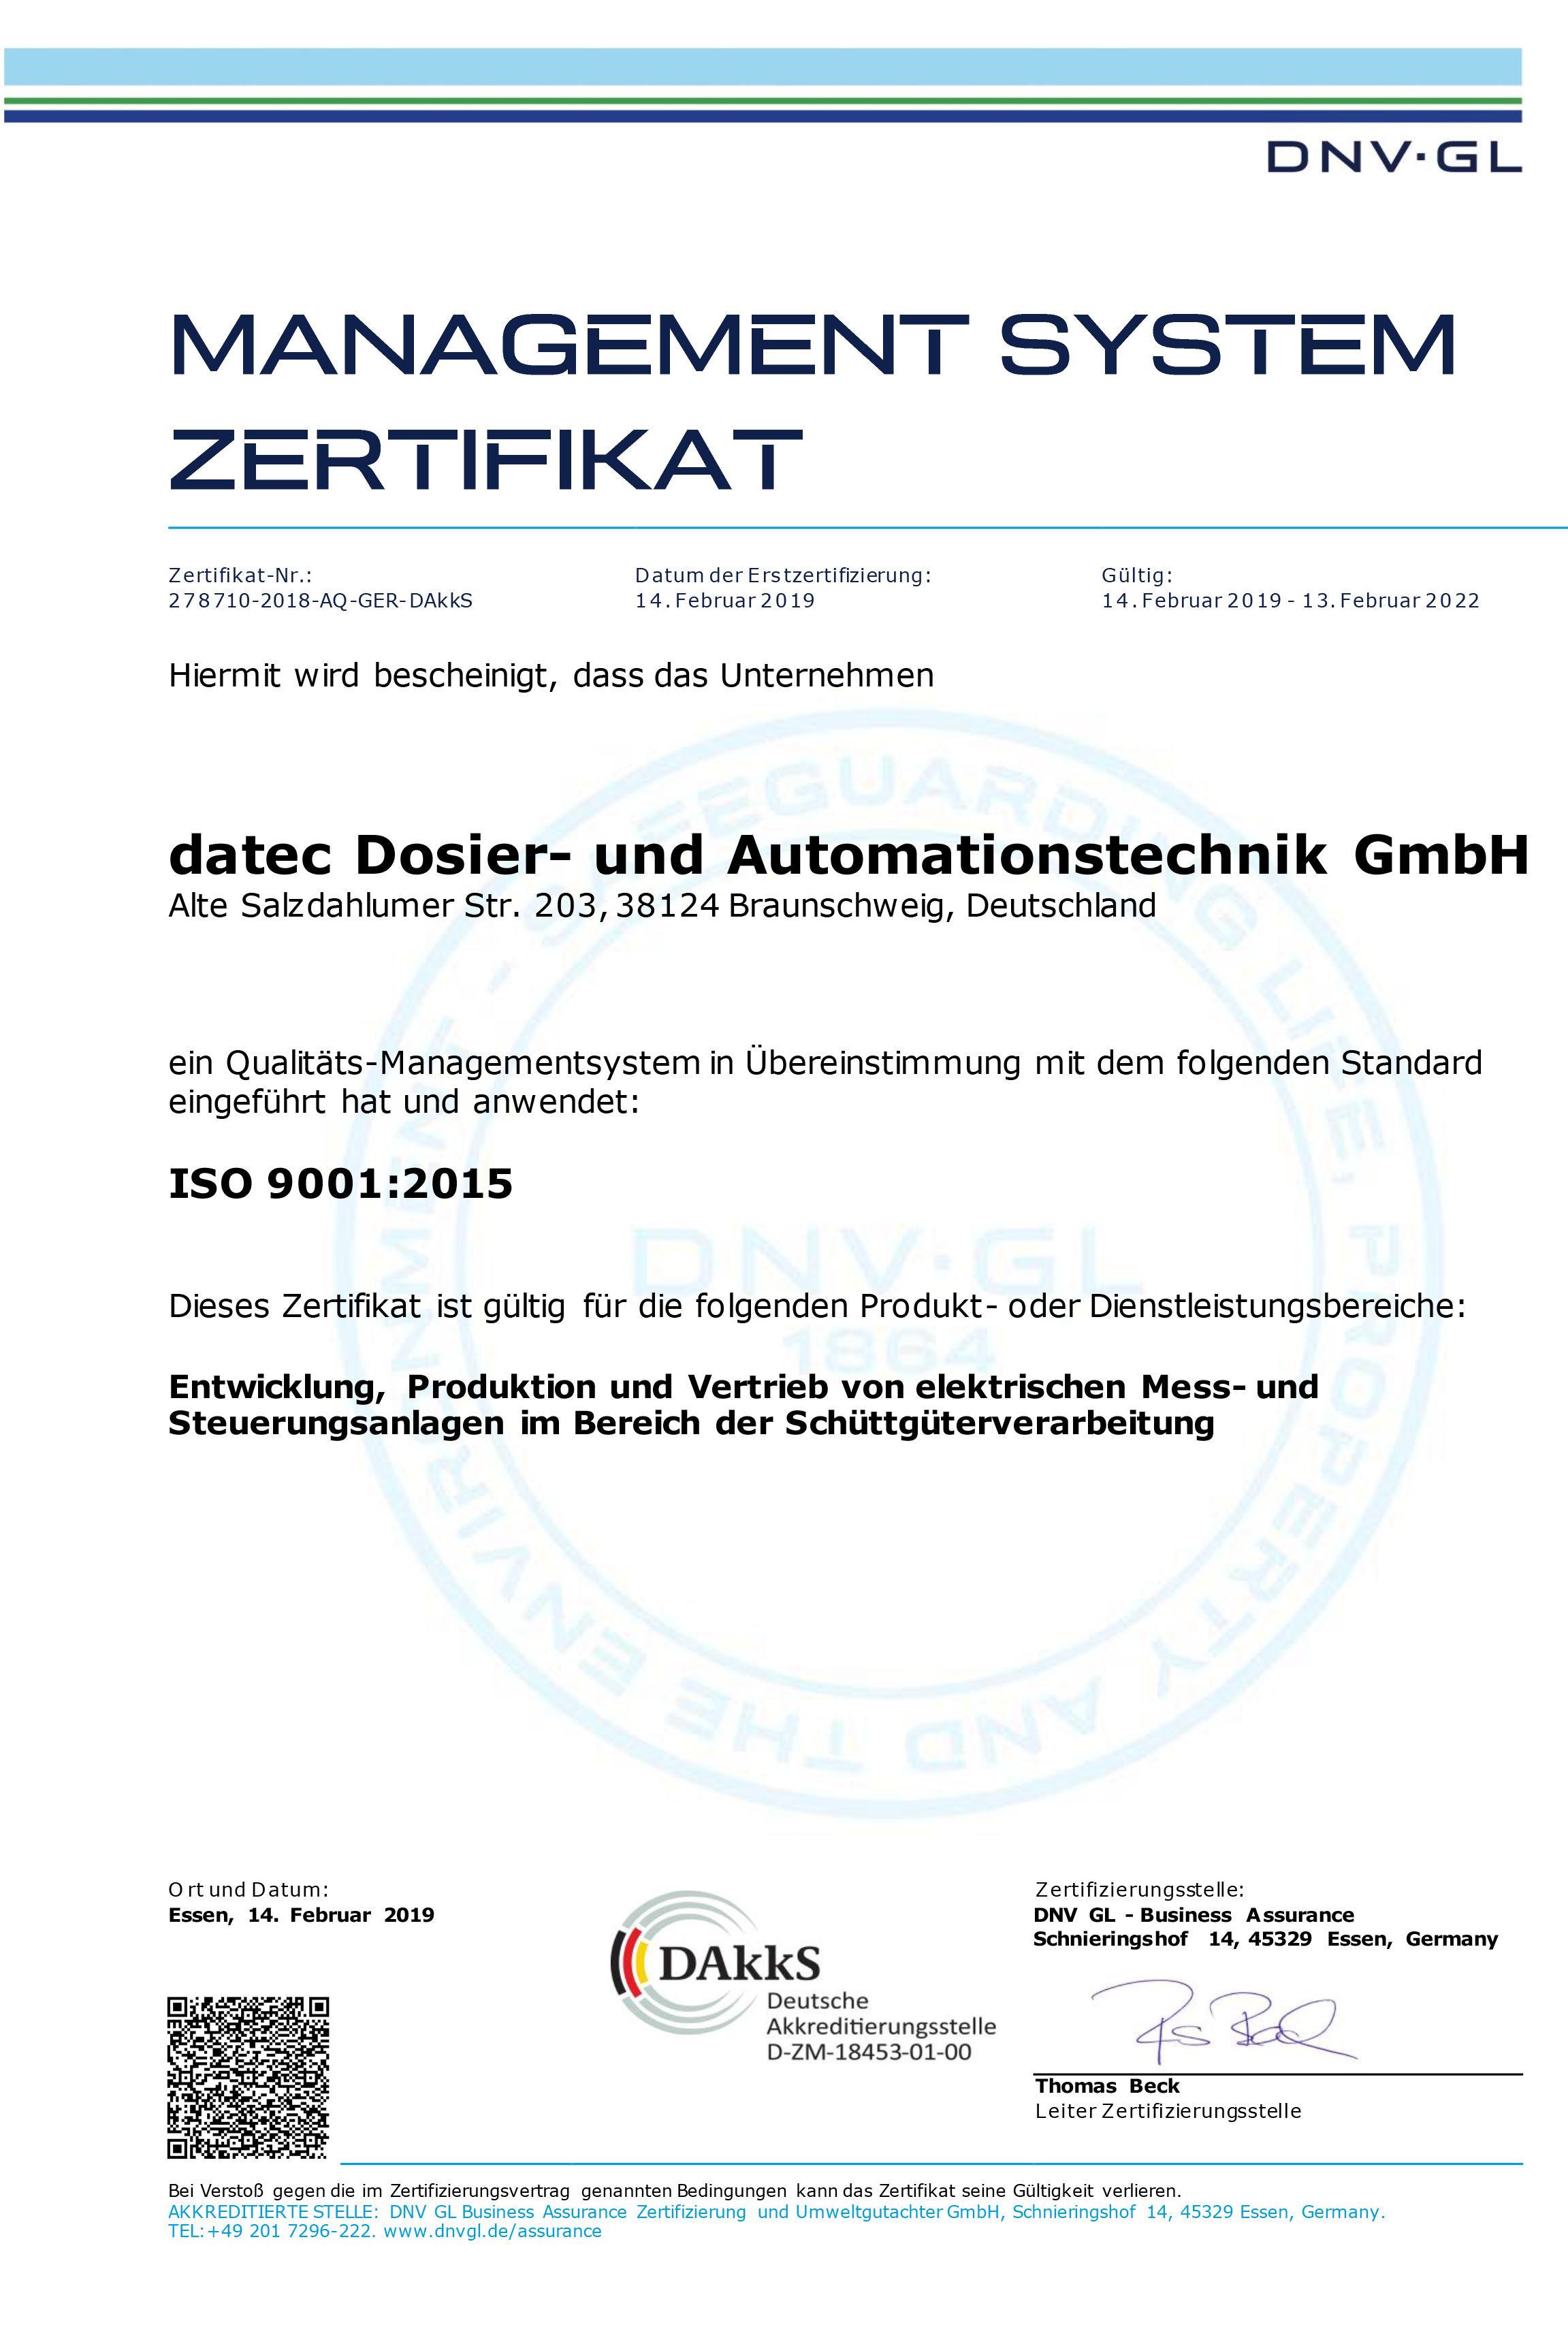 Qualitätsmanagement Zertifikat ISO 9001:2008